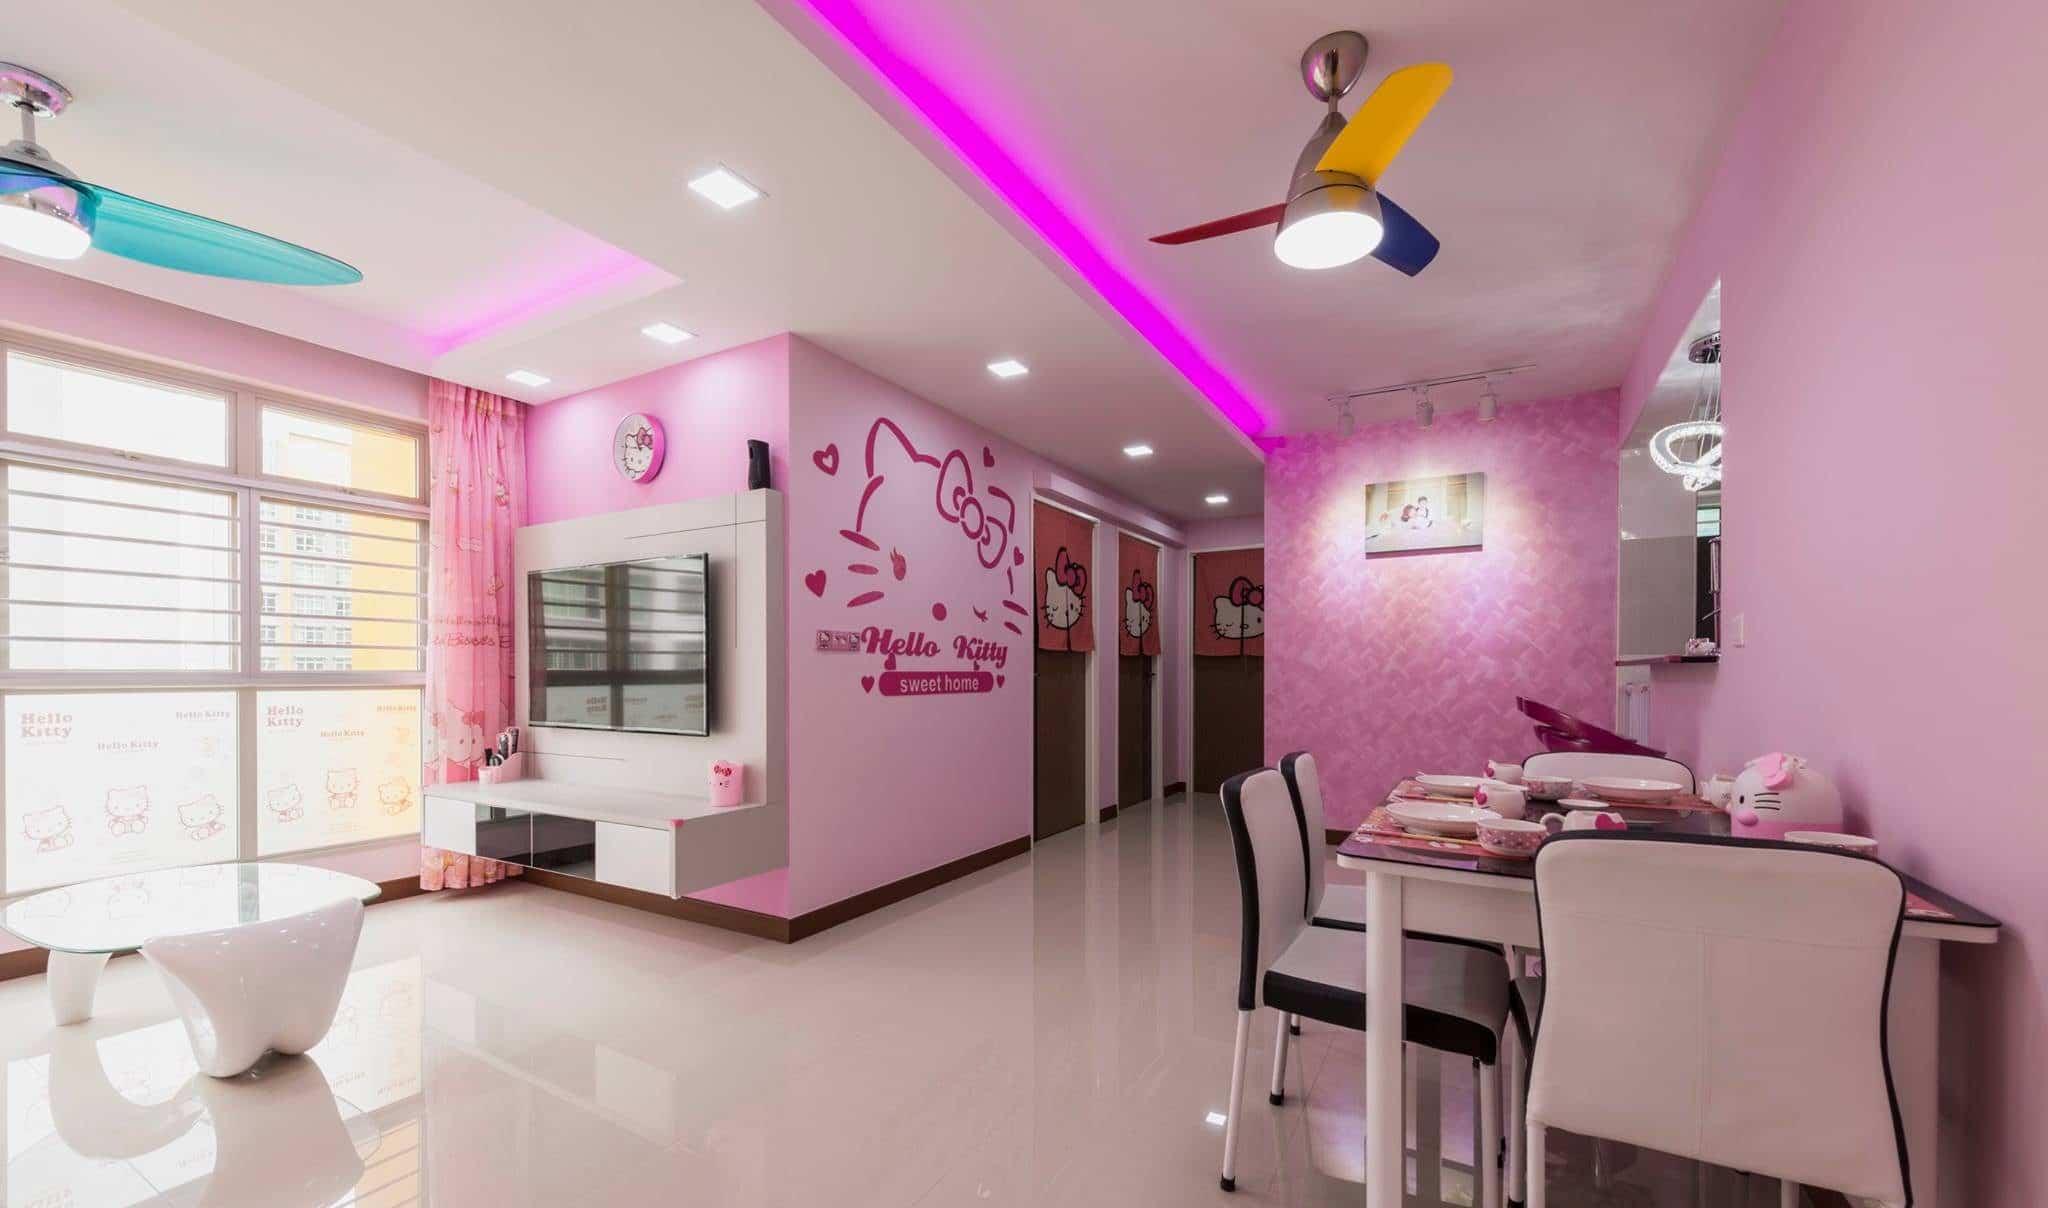 Modern Hello Kitty Theme Interior Design Fifth Avenue